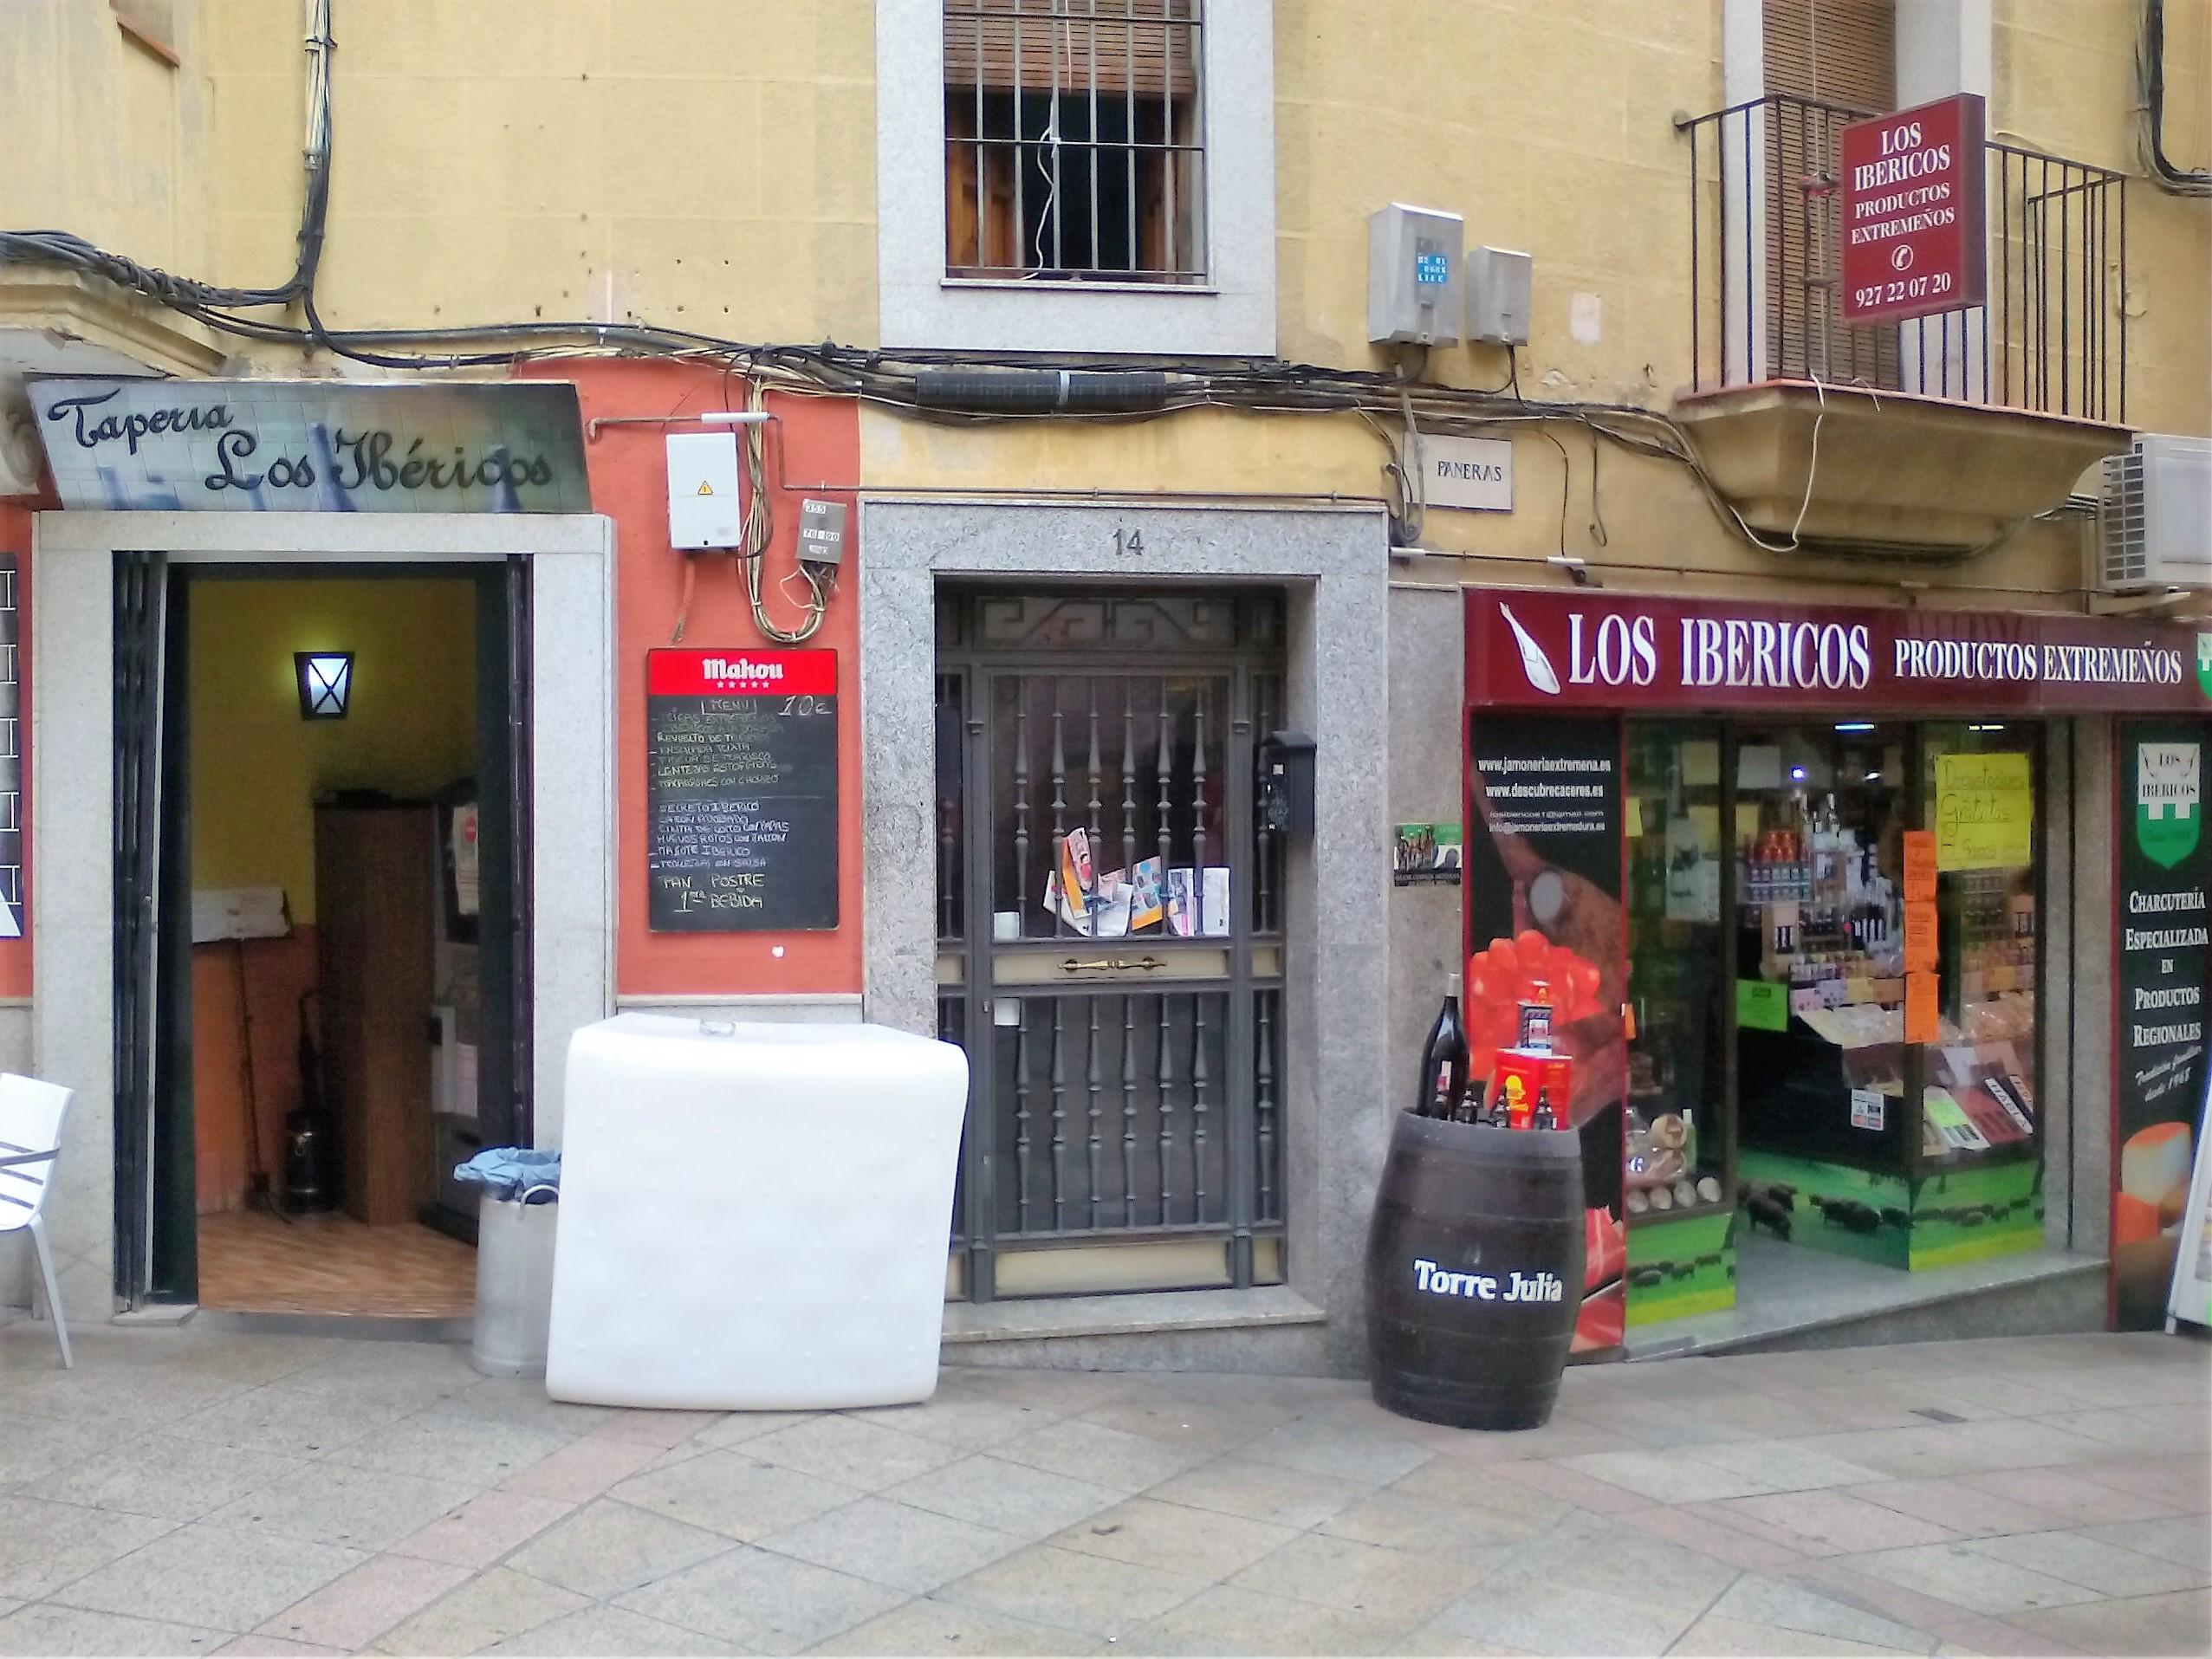 taperia-productos-extremenos-caceres-ibericos